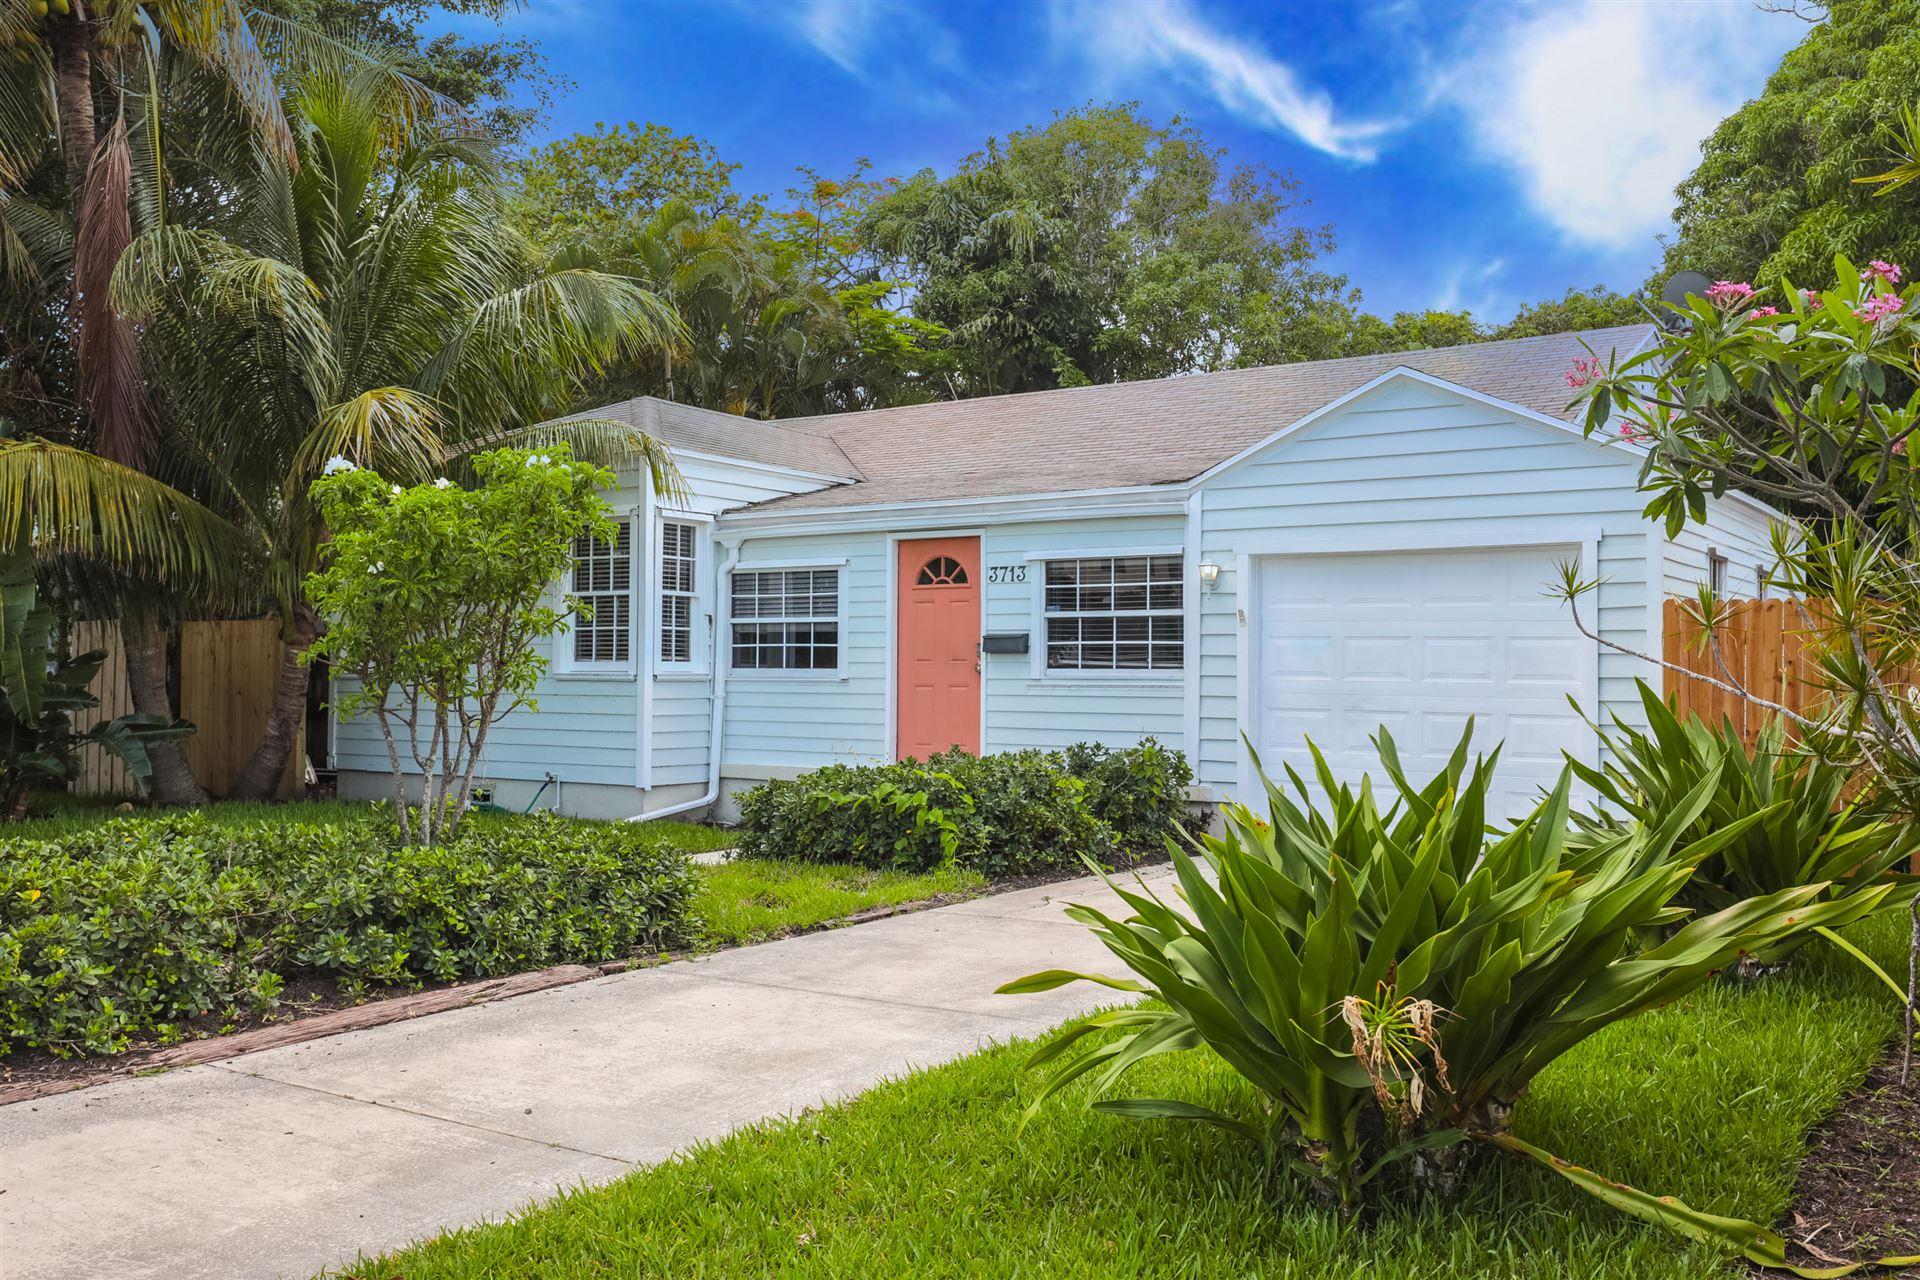 3713 N Flagler Drive, West Palm Beach, FL 33407 - #: RX-10626388